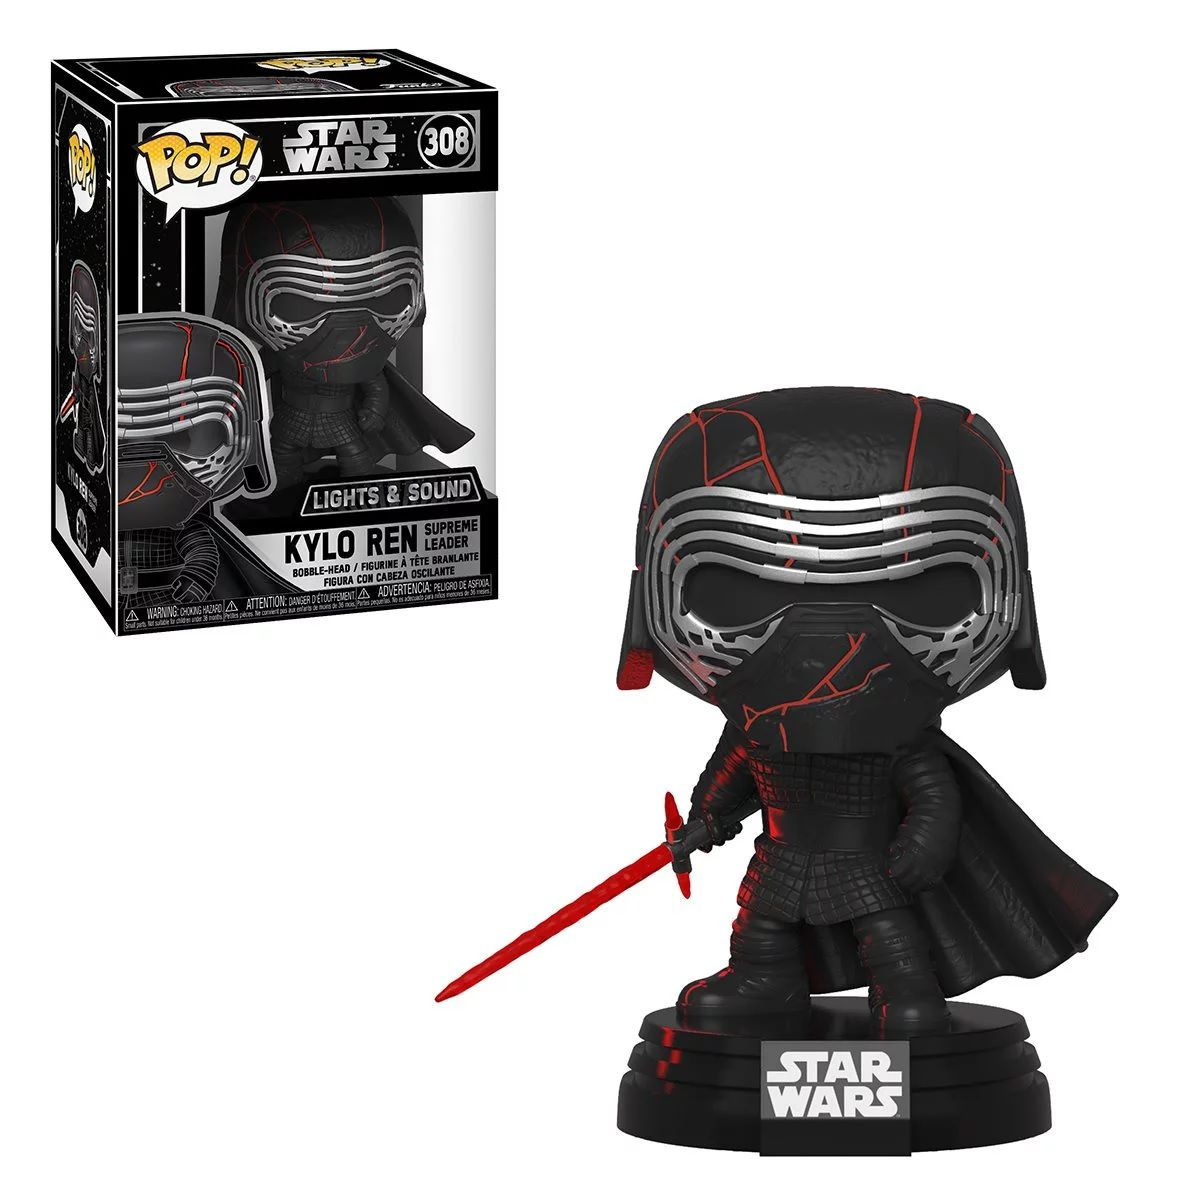 Funko Pop! Kylo Ren: Star Wars A Ascensão Skywalker (Star Wars The Rise of Skywalker) (Lights And Sound) #308 - Funko